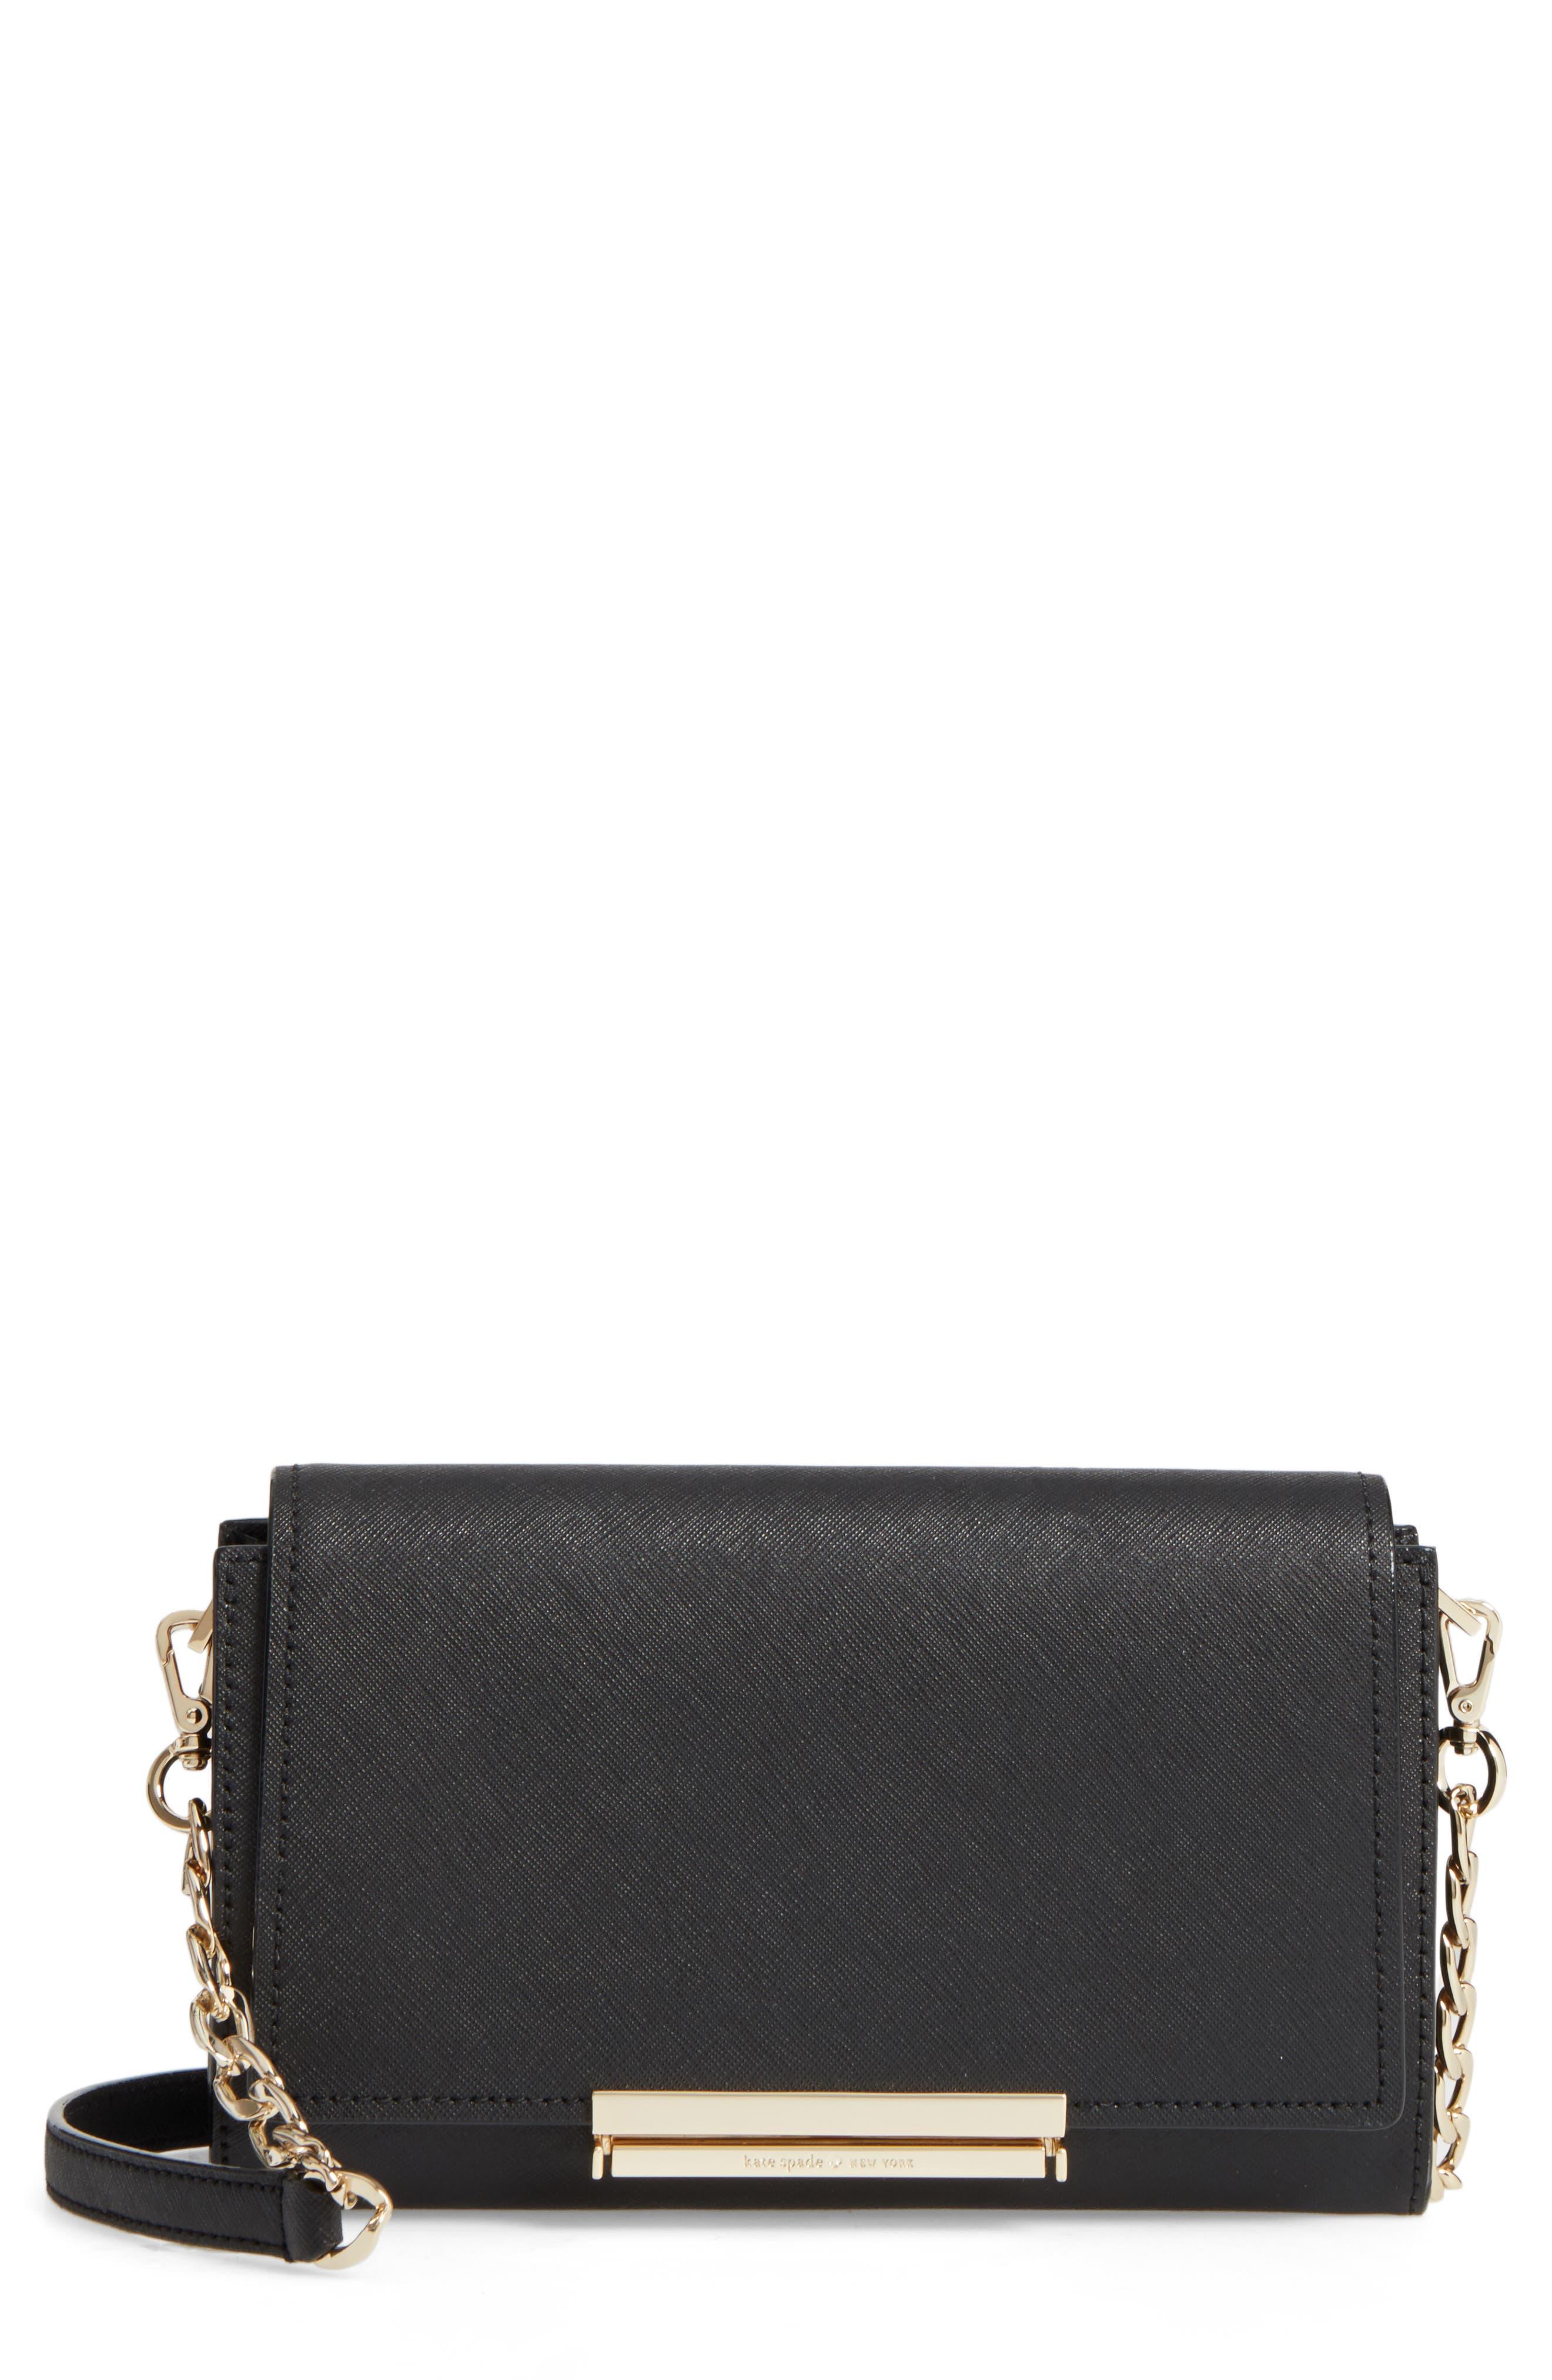 make it mine - camila leather clutch,                         Main,                         color,